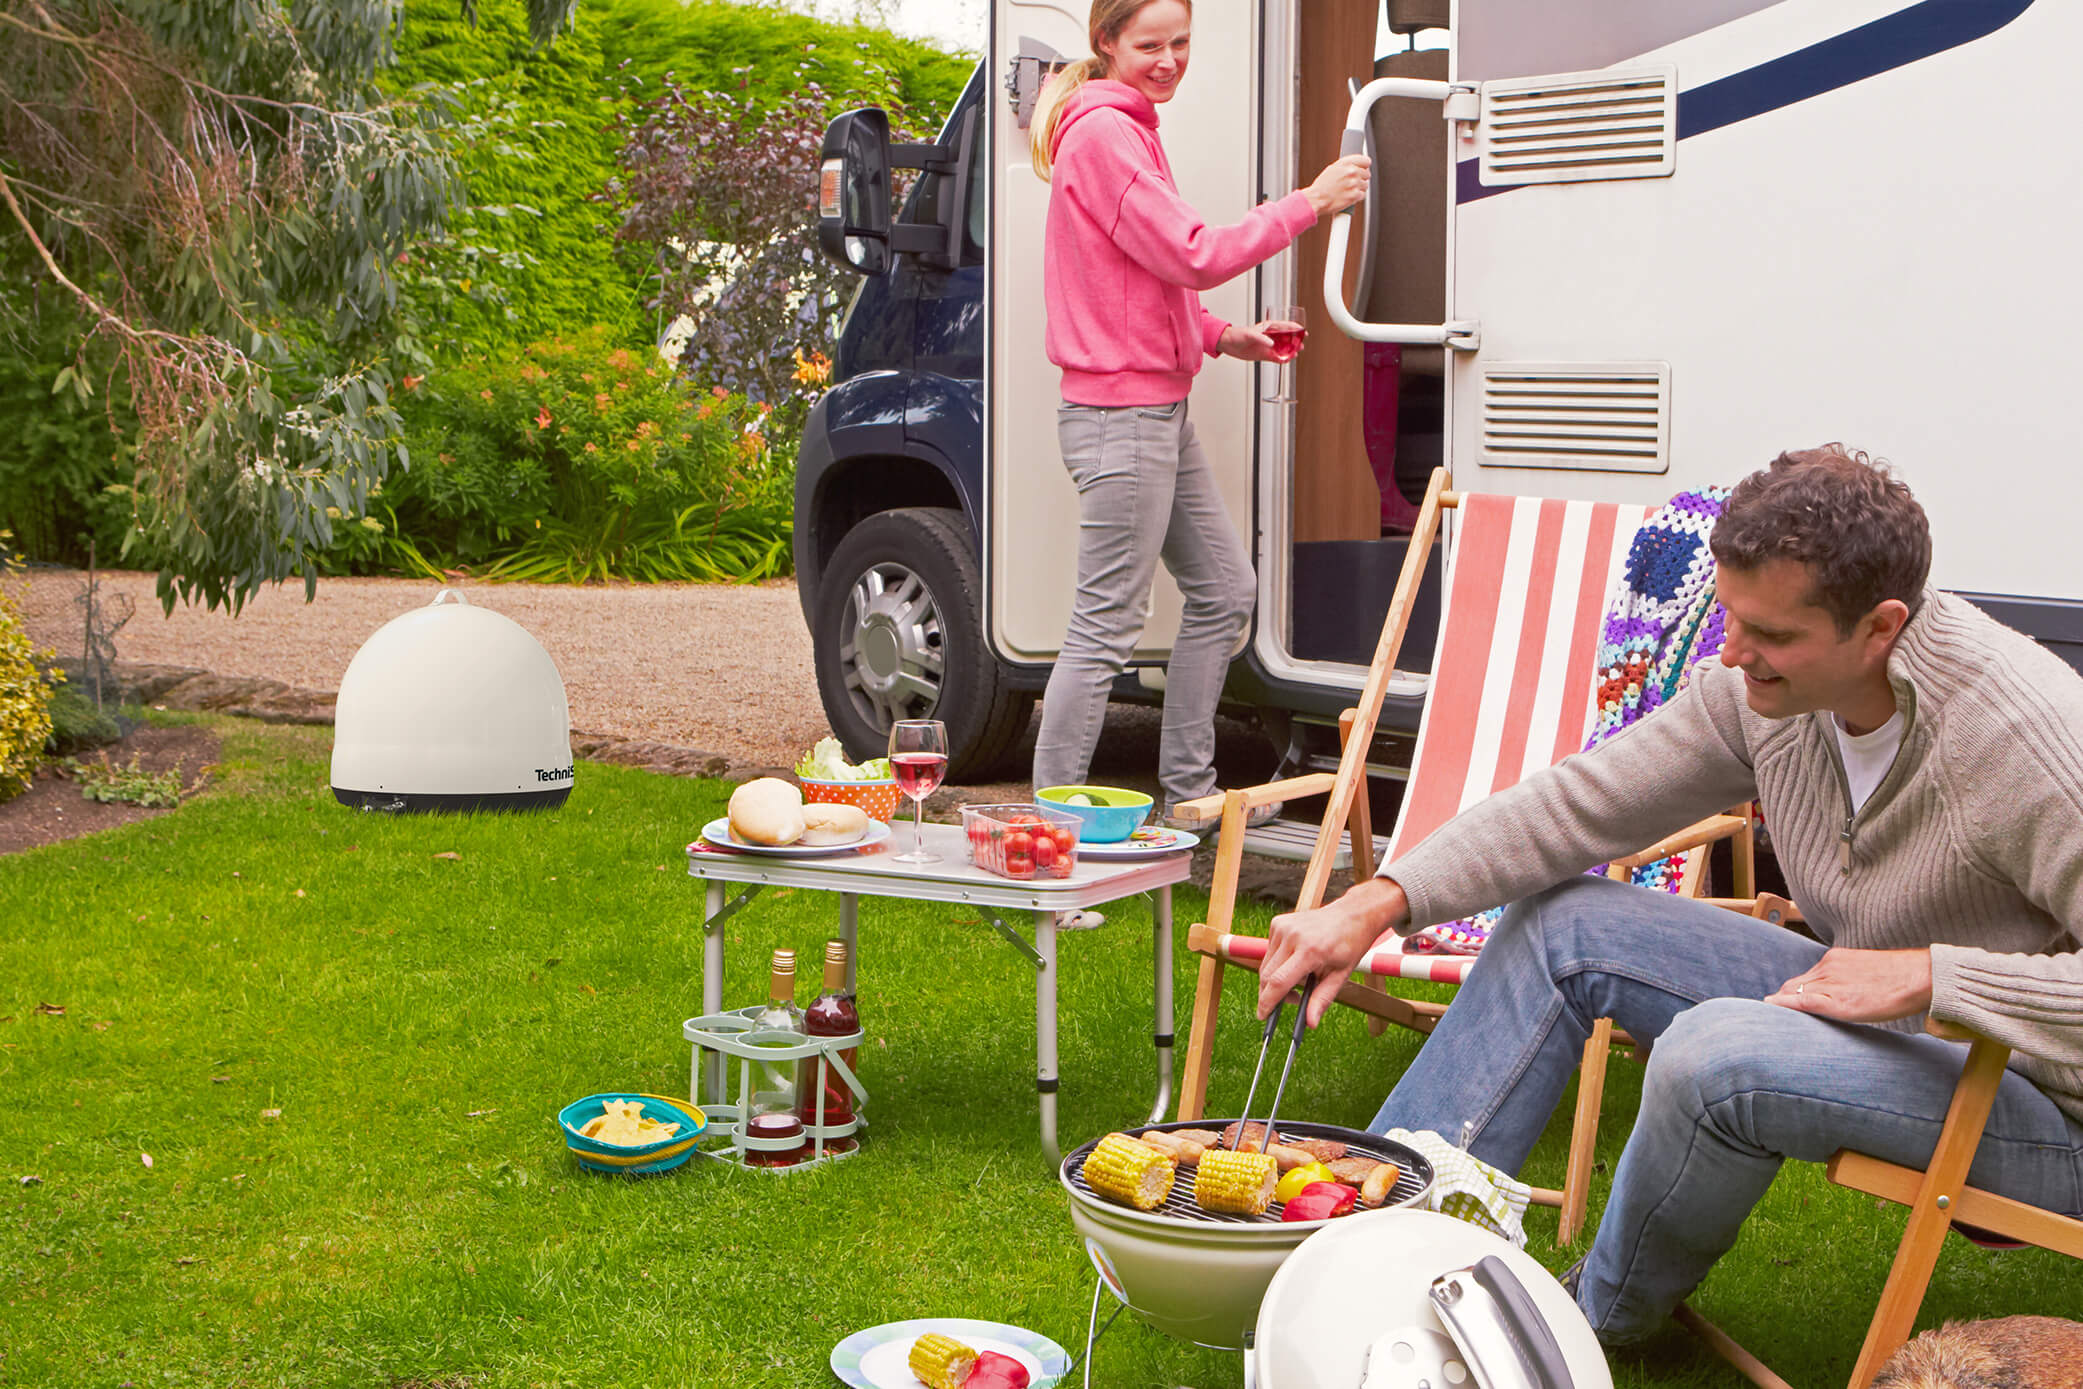 Camping mit TechniSat -  Perfekter TV-Empfang unterwegs